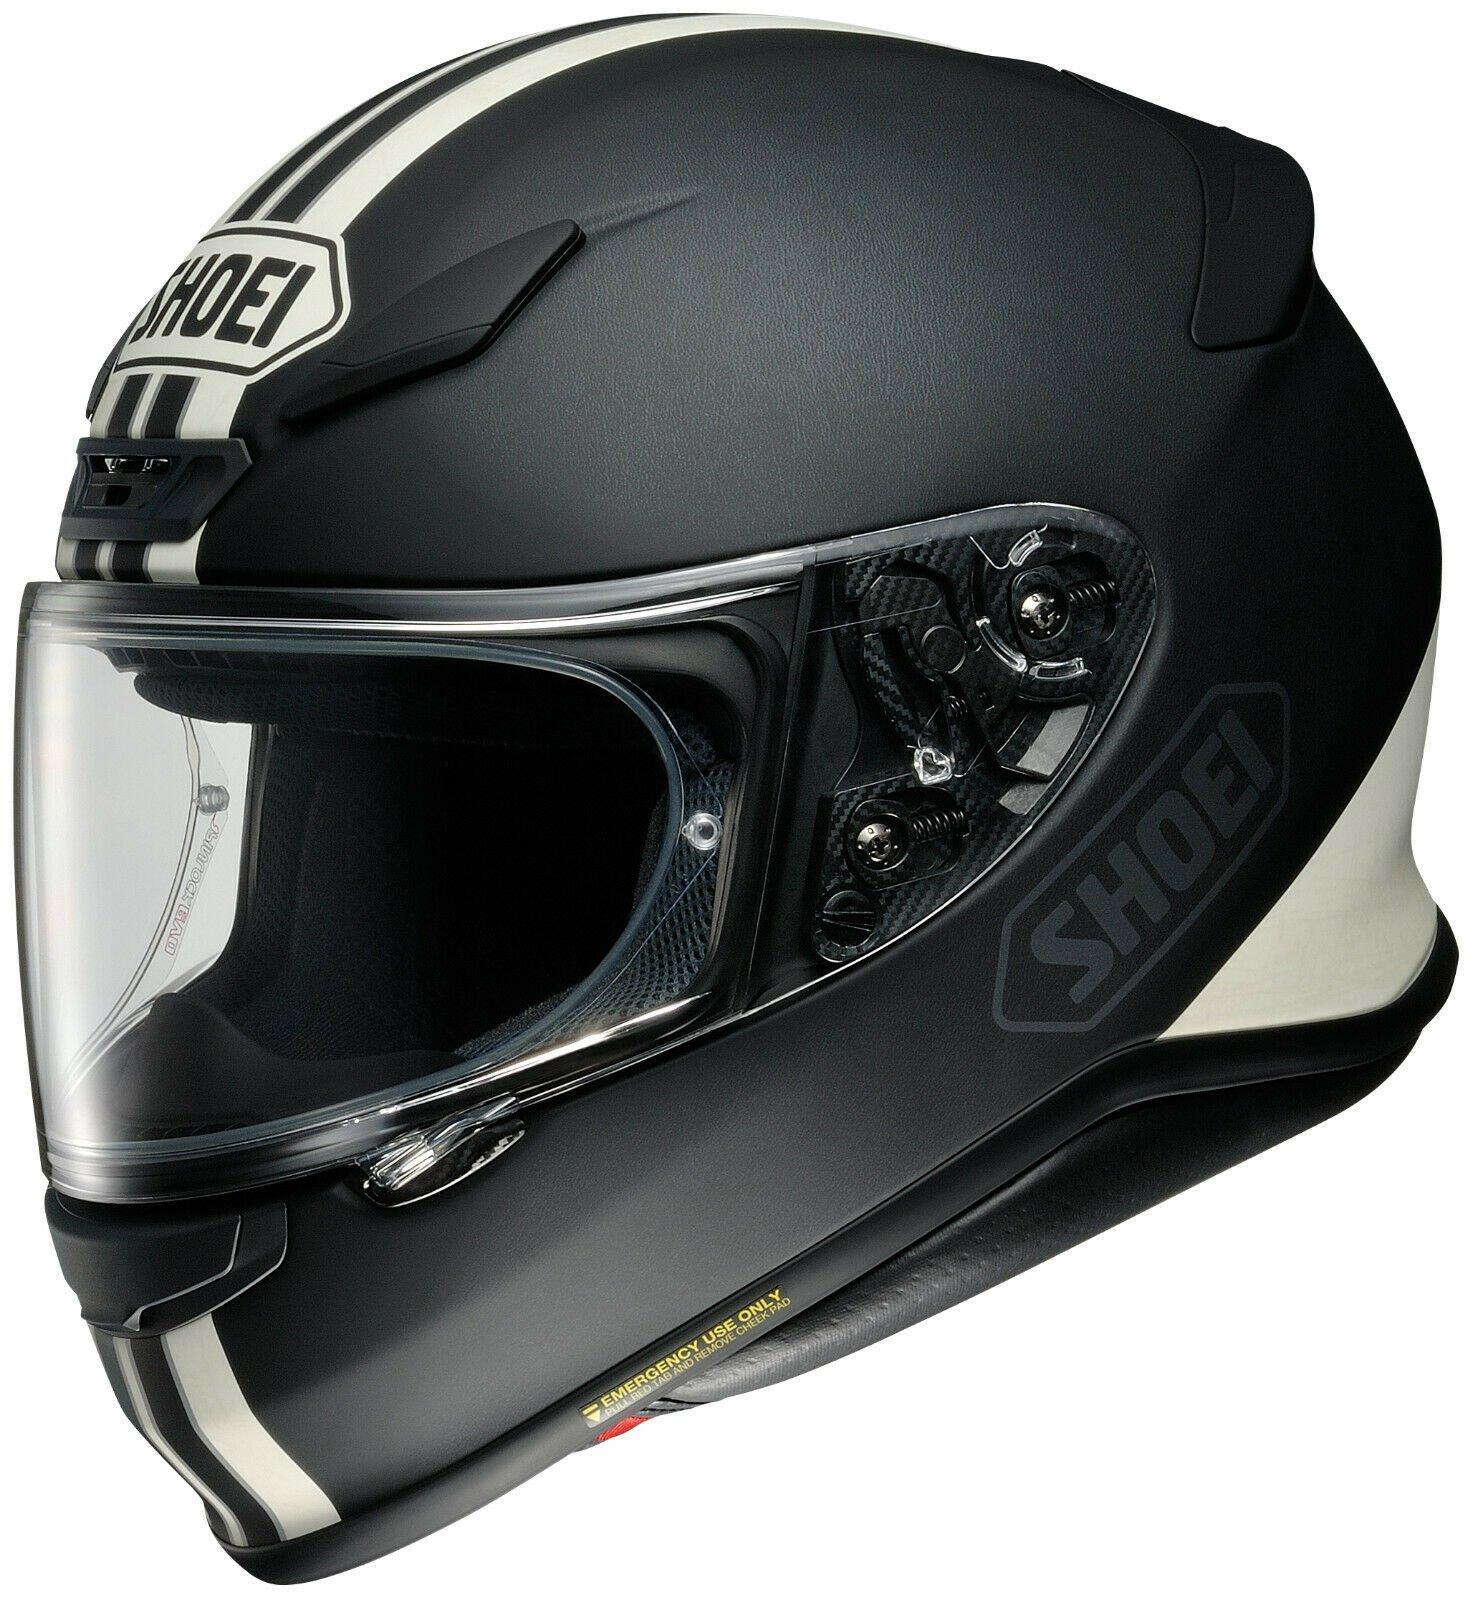 SHOEI-RF-1200-EQUATE-Helmet-ALL-SIZES-DOT-SNELL-Street-Full-Face-Patriotic miniature 8